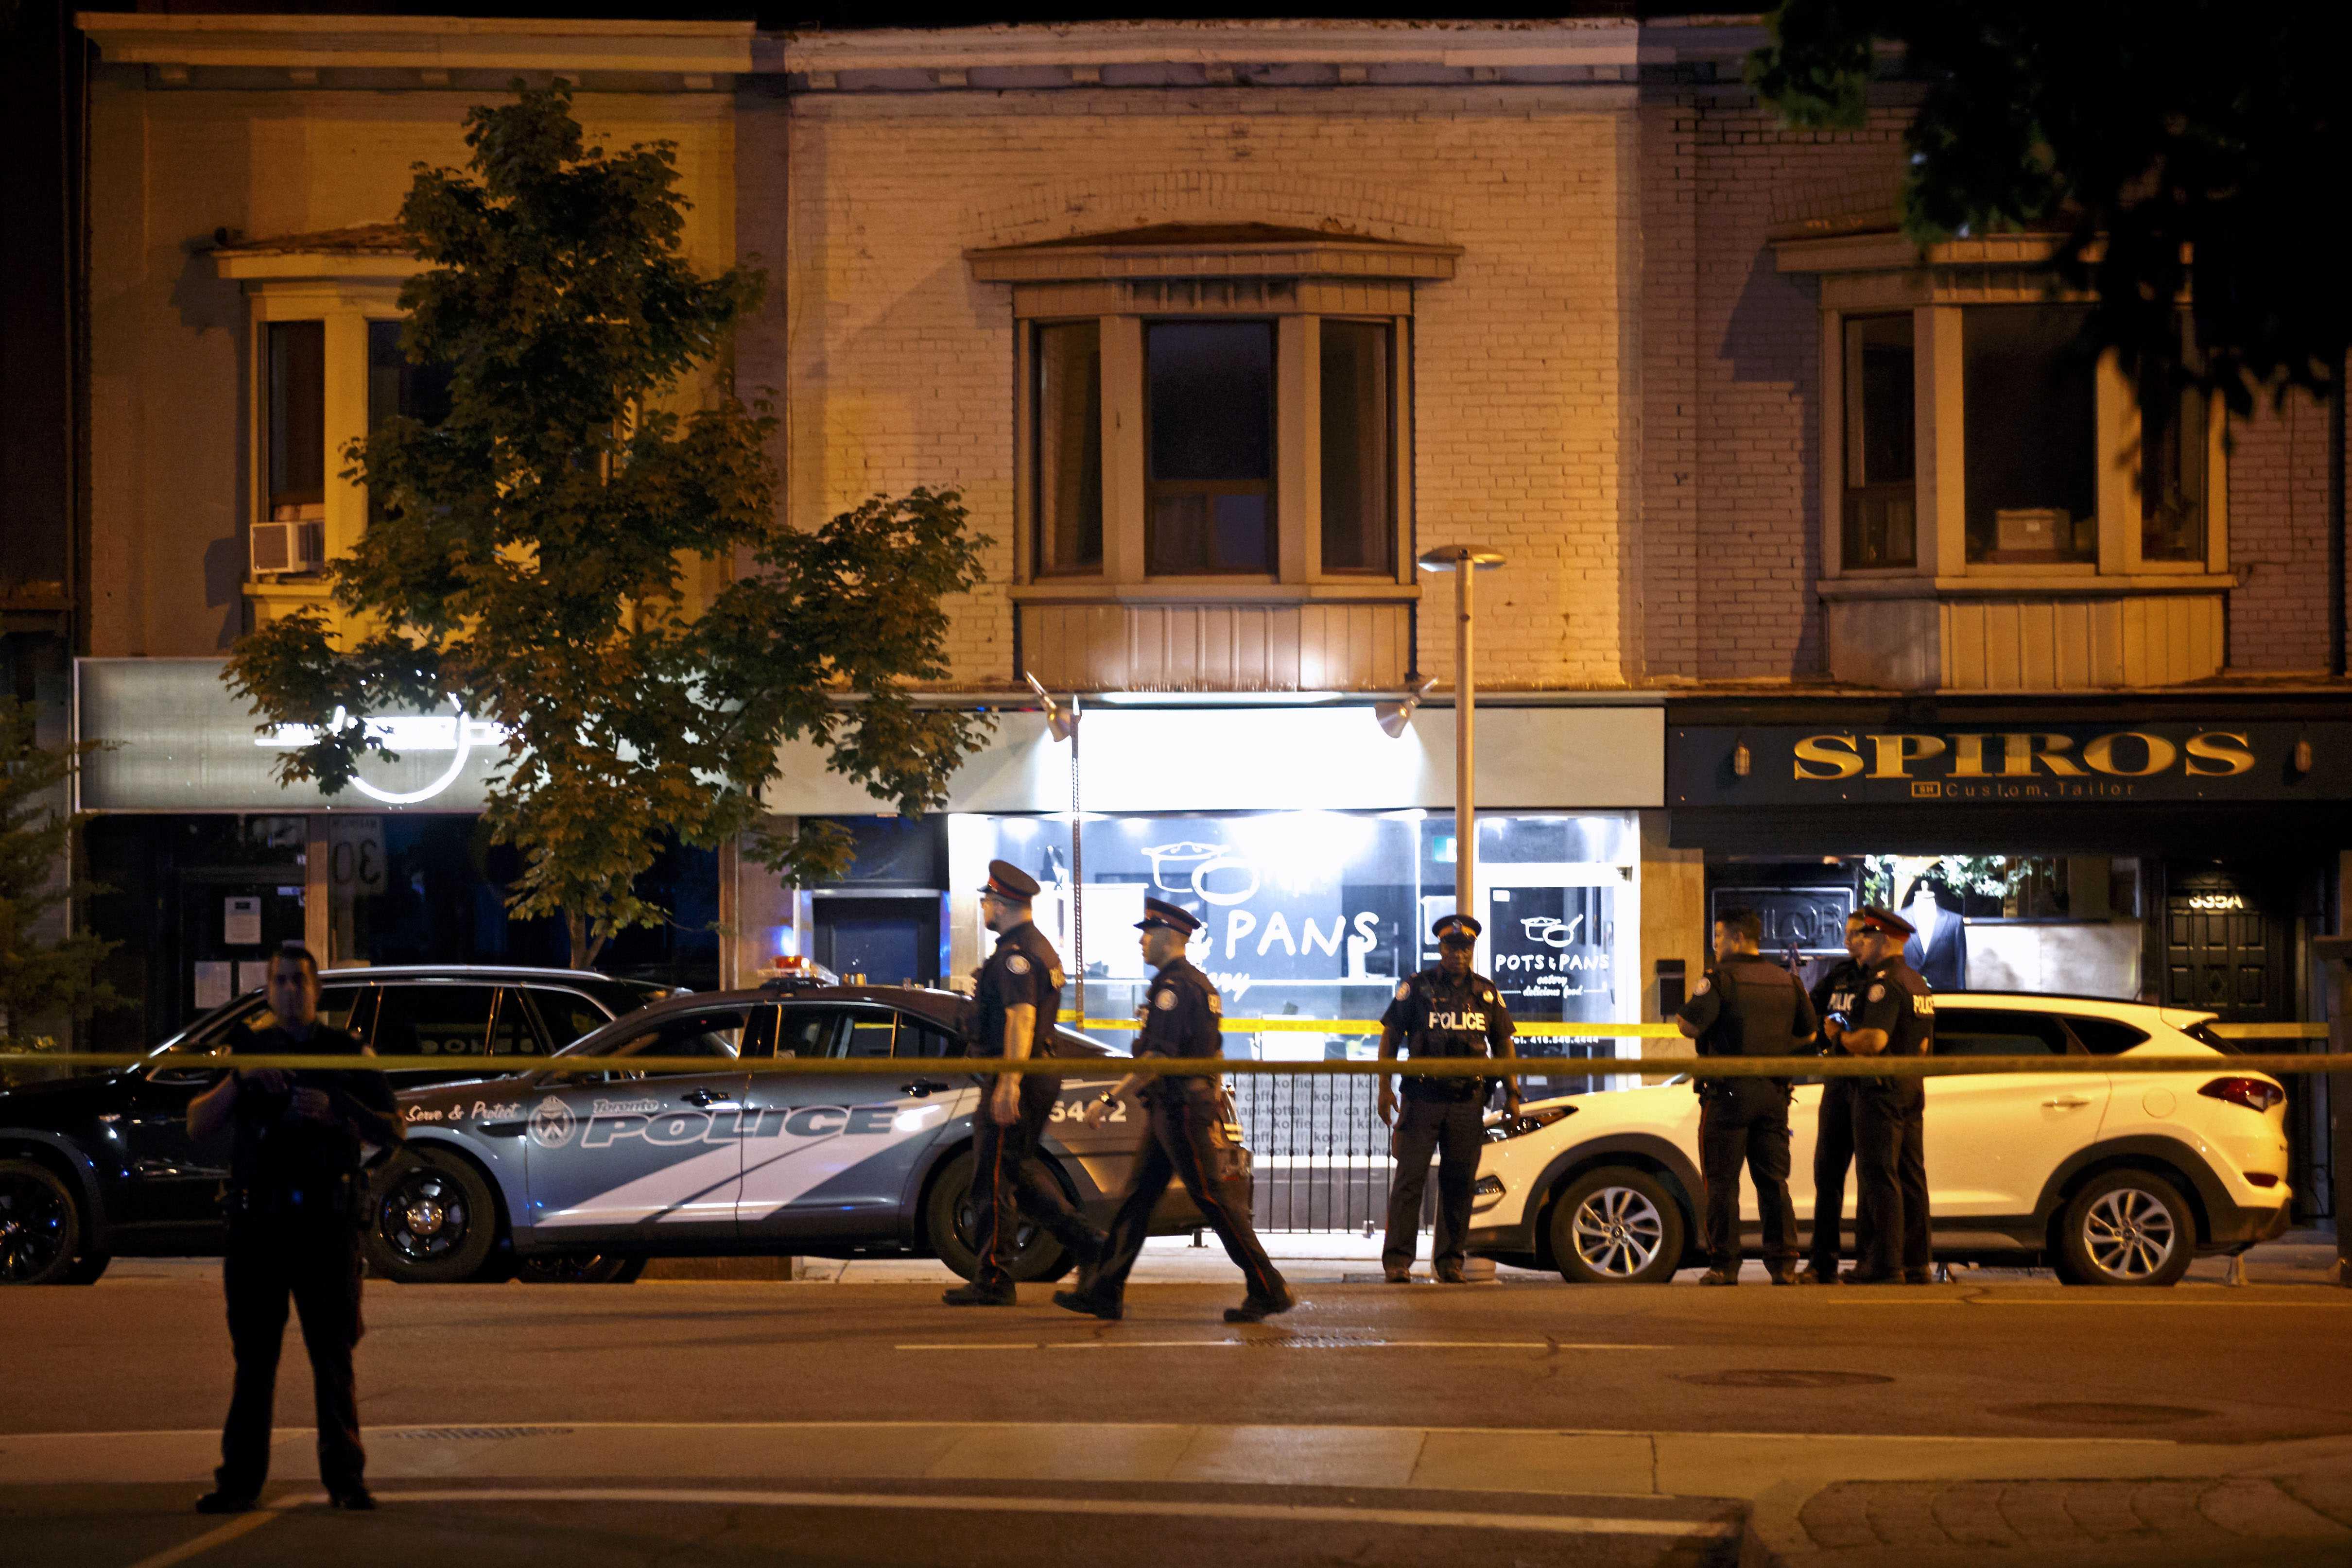 Man firing into Toronto cafes shoots 14 people, killing 1